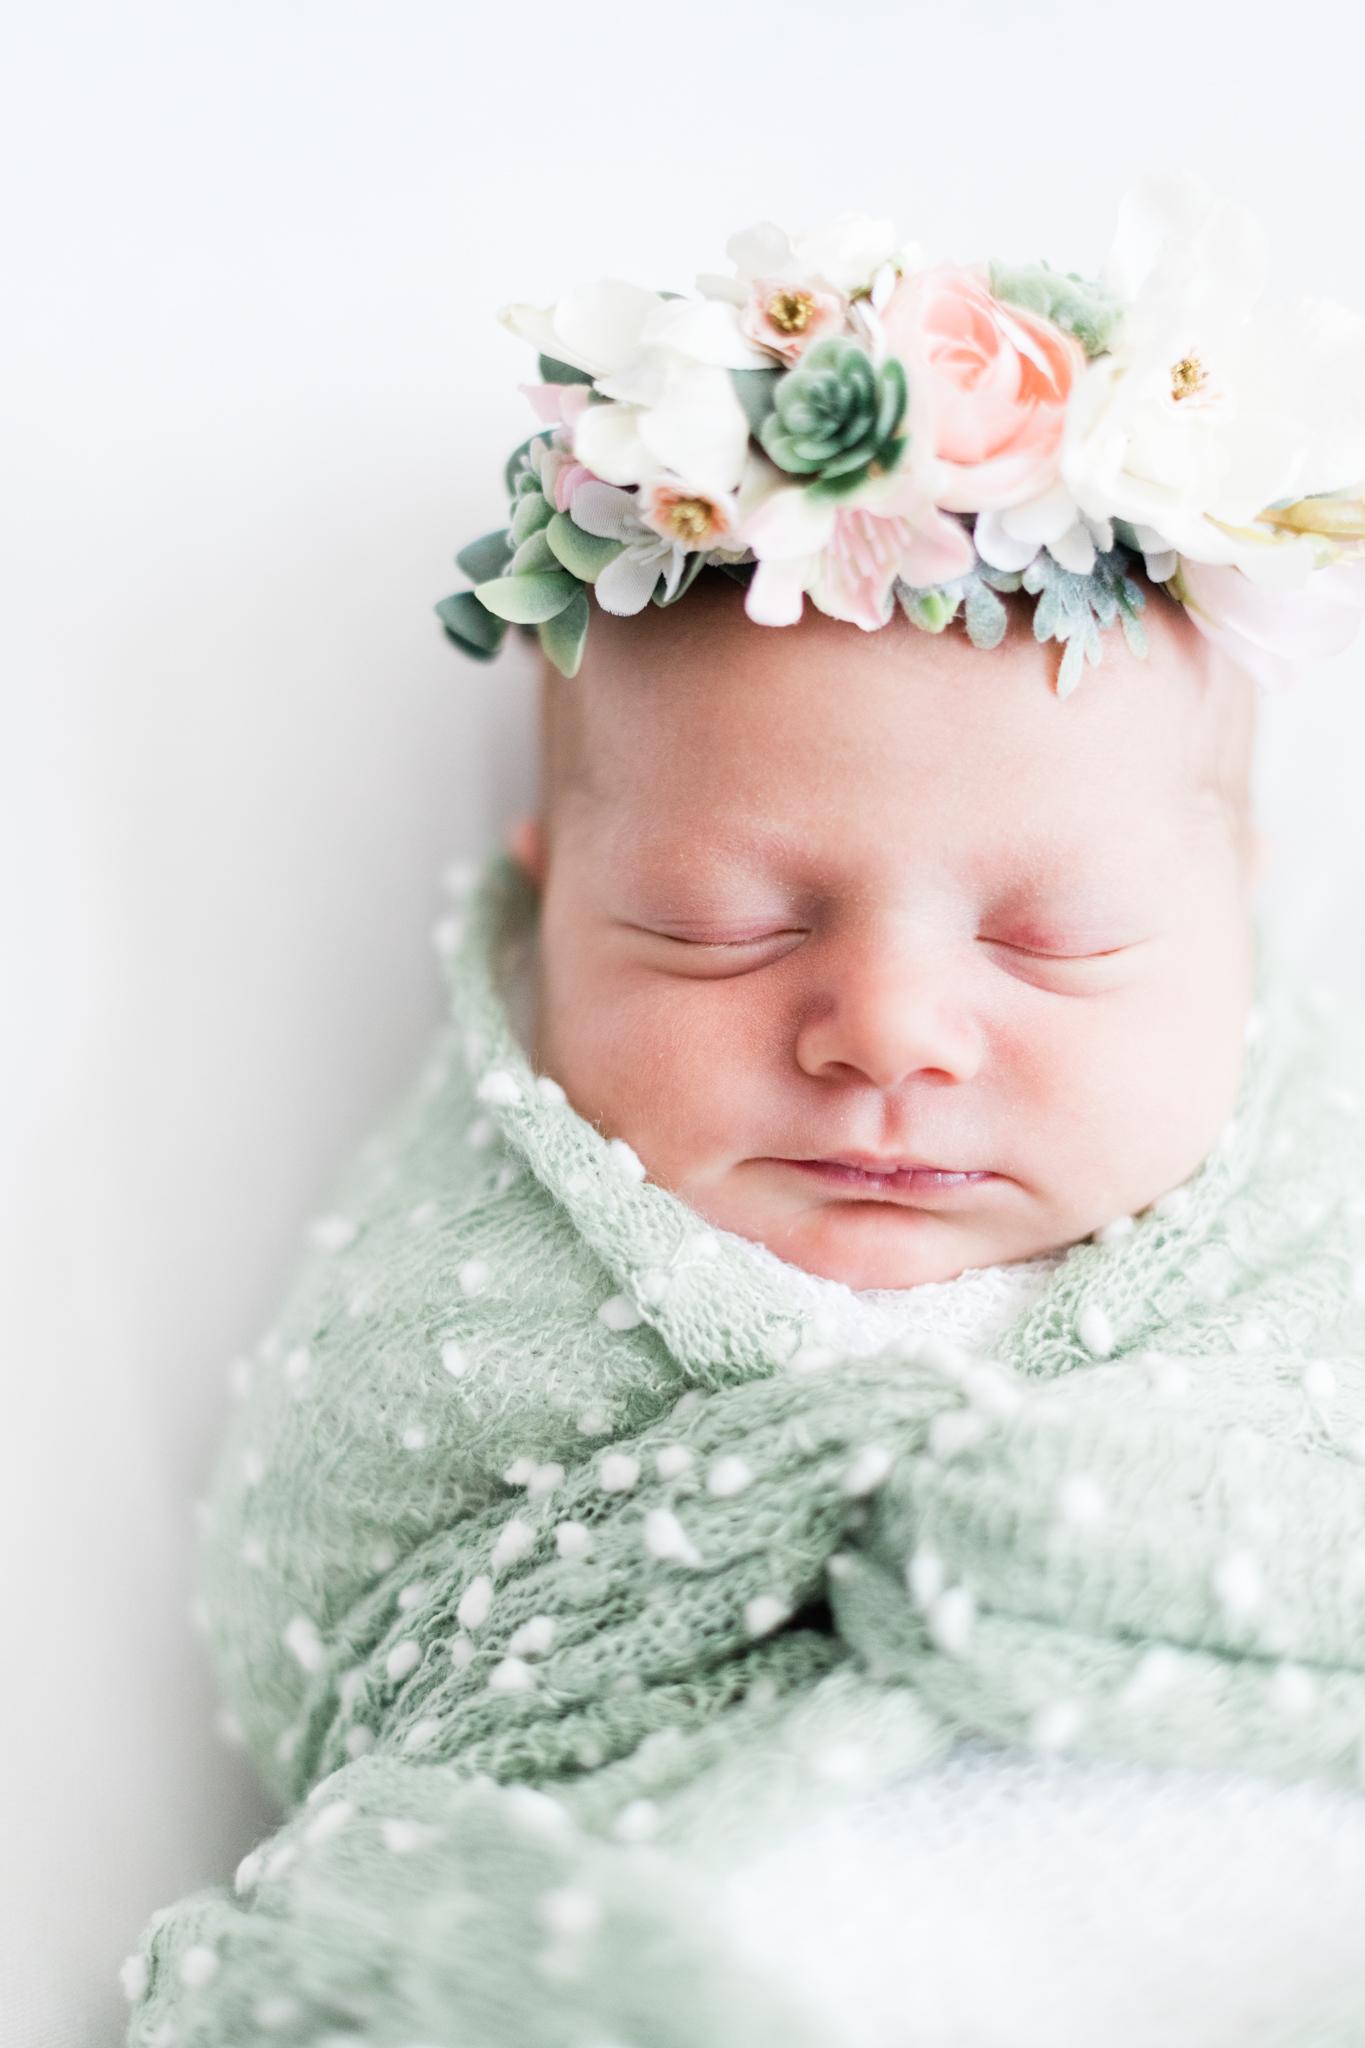 Keystone Lifestyle in Home Newborn Photo